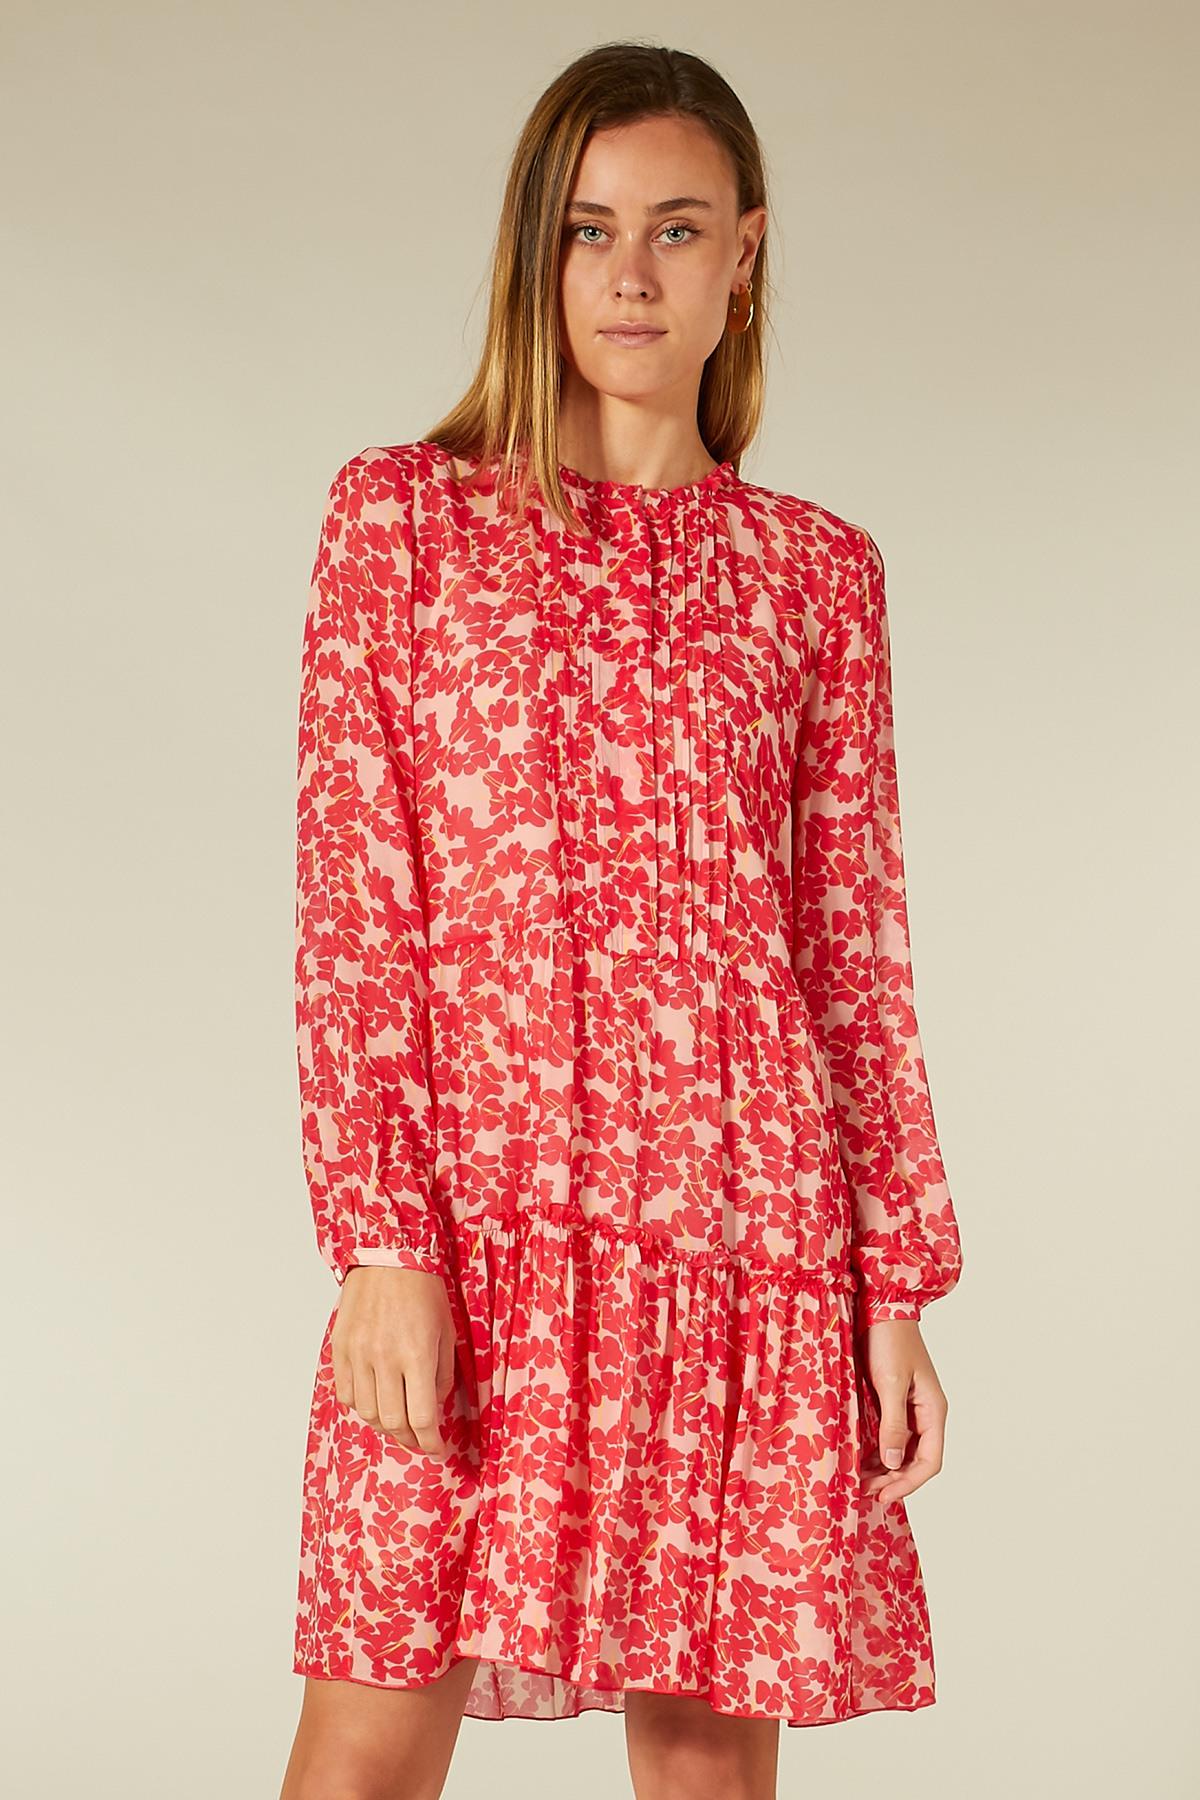 Kleid Aus Viskosechiffon  Bloom  Bloomclothing